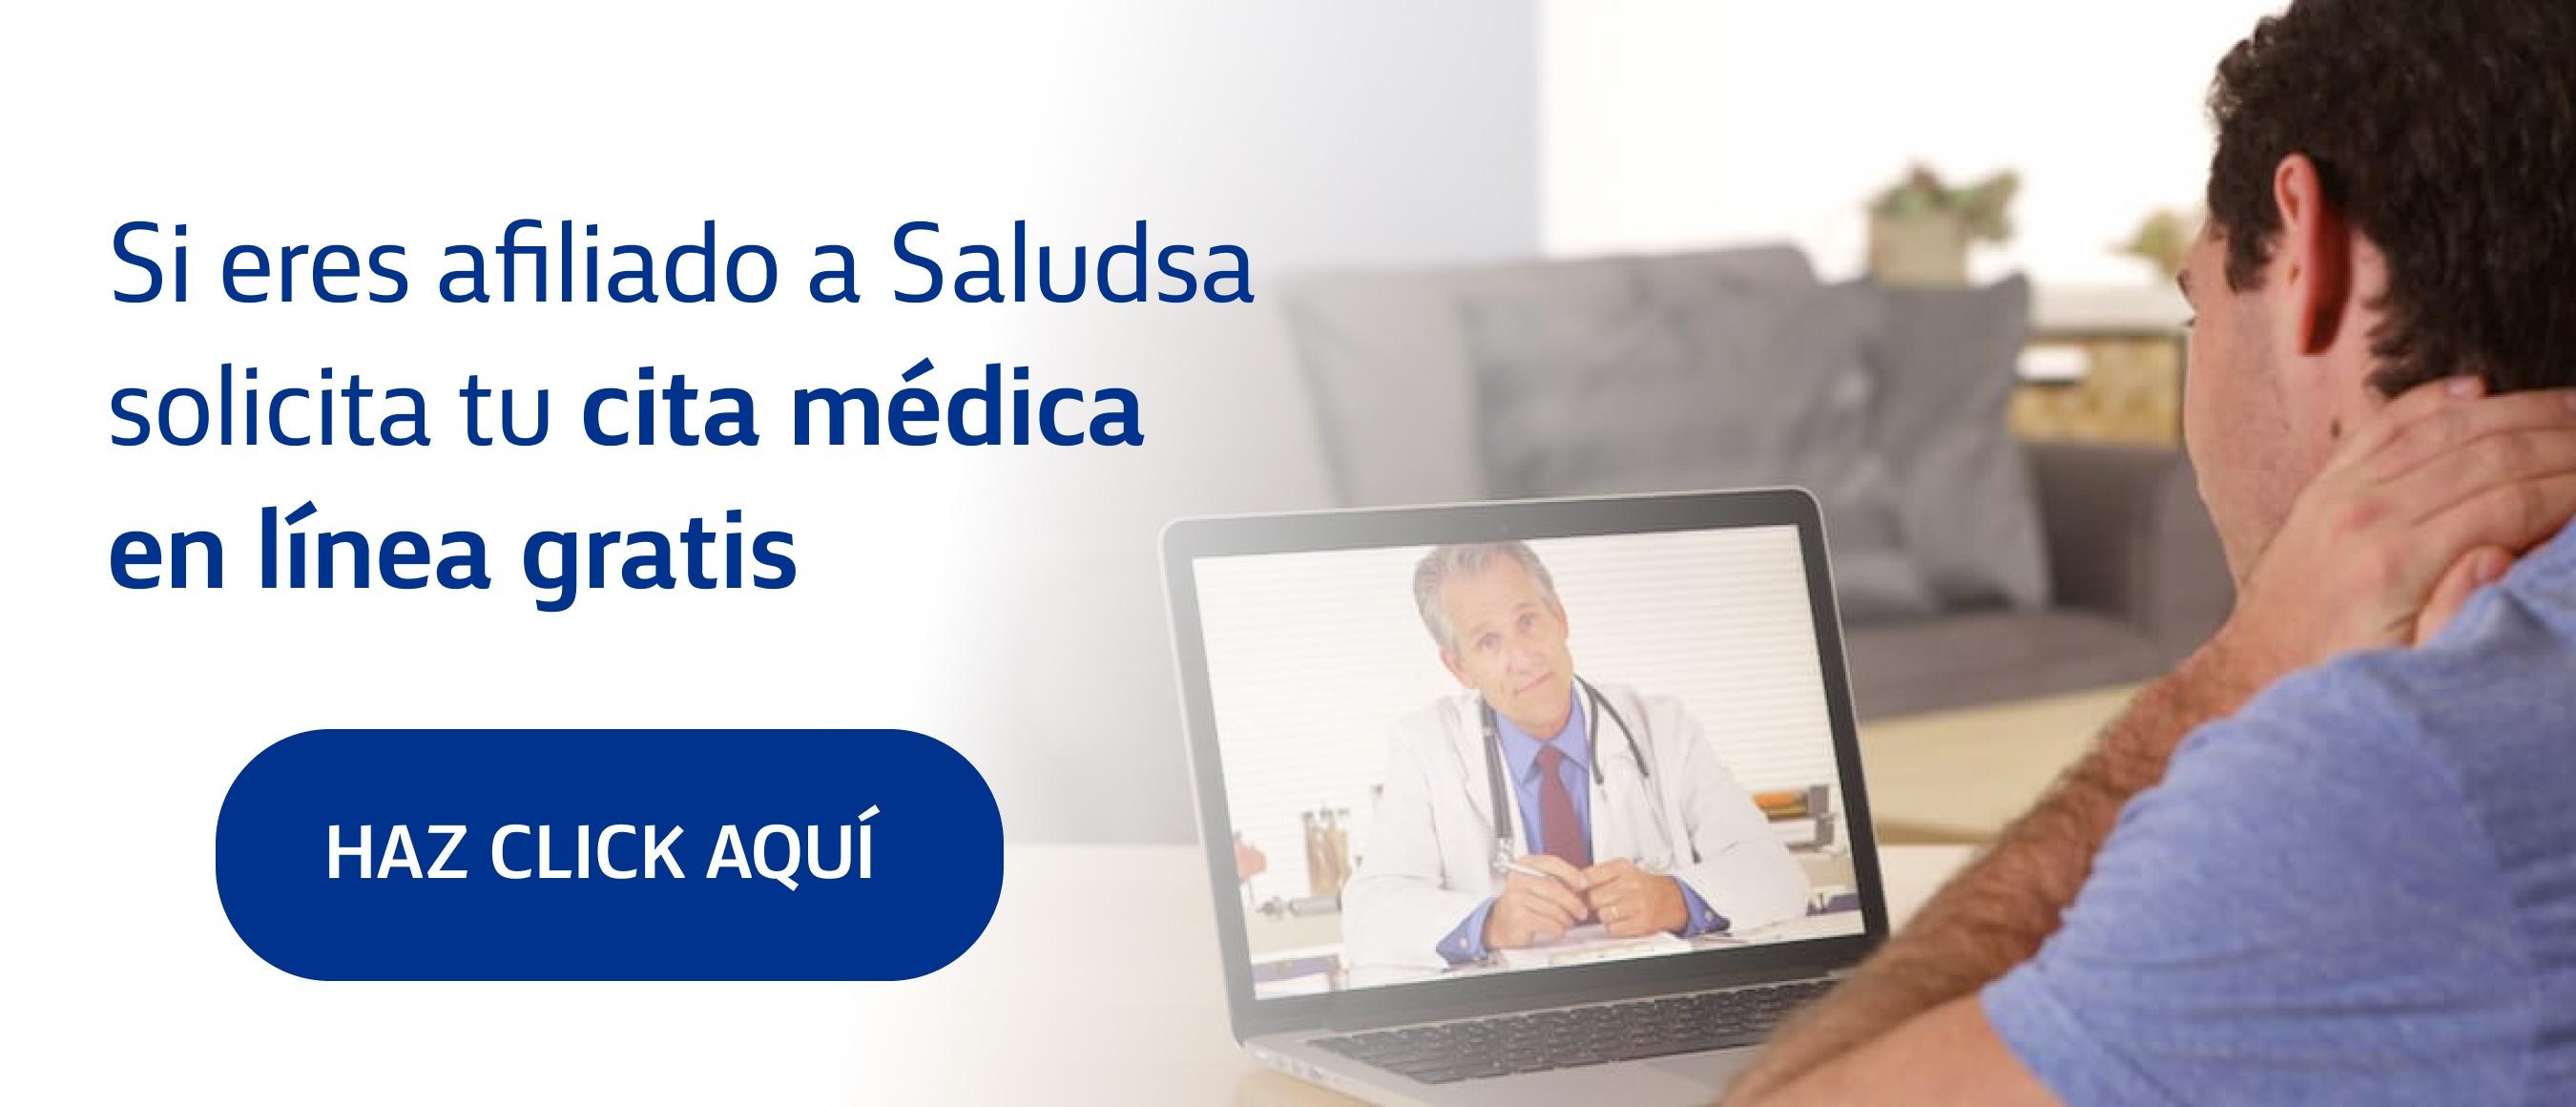 Cita médica en línea